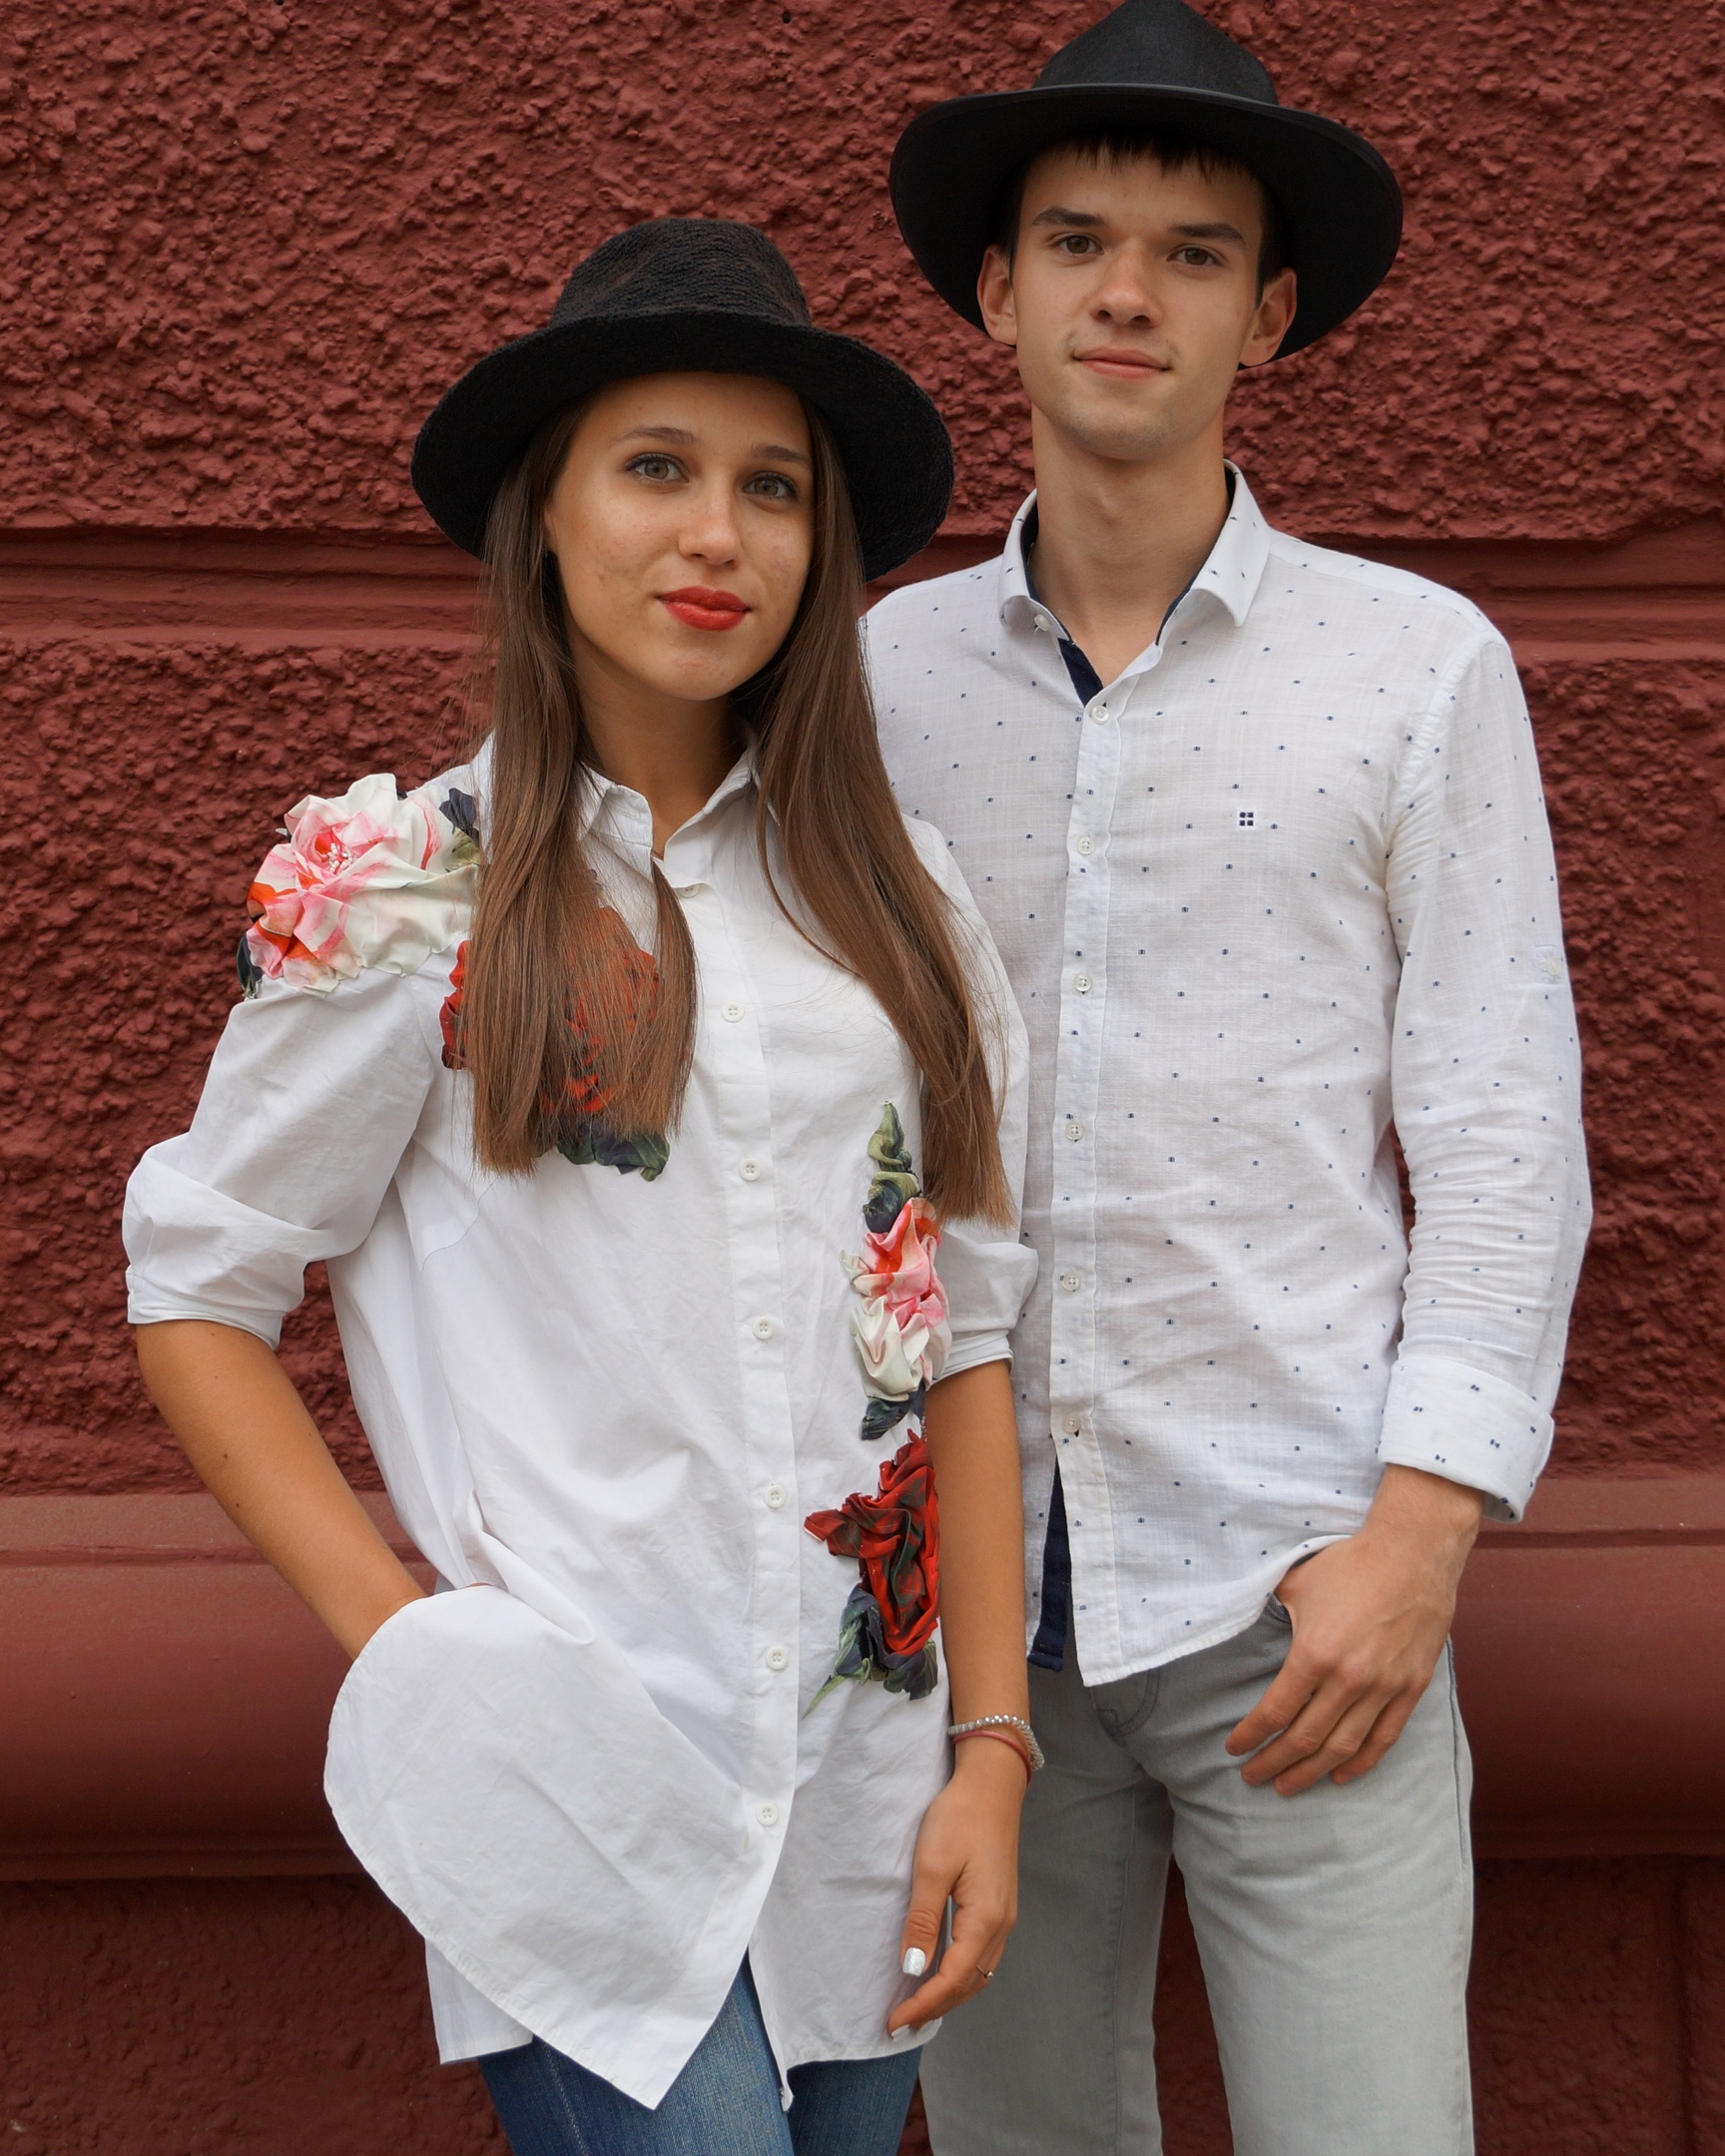 Загоровский Михаил и Петришена Алина